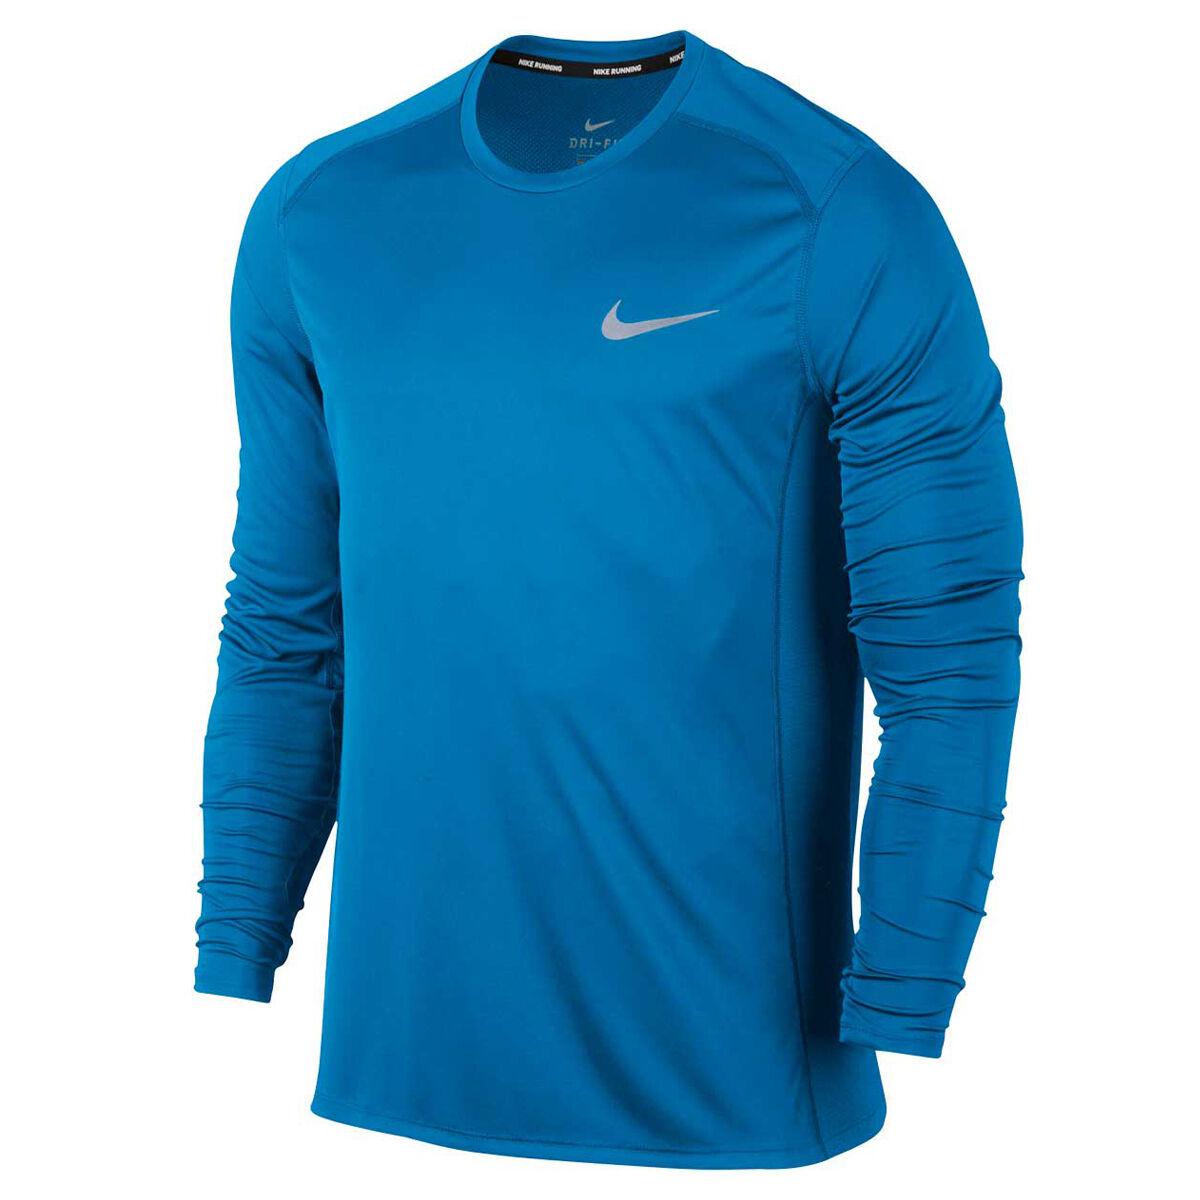 e66b2ebf1 Nike mens dri fit miler long sleeve tee rebel sport jpg 1000x1000 Chiefs  nike red long